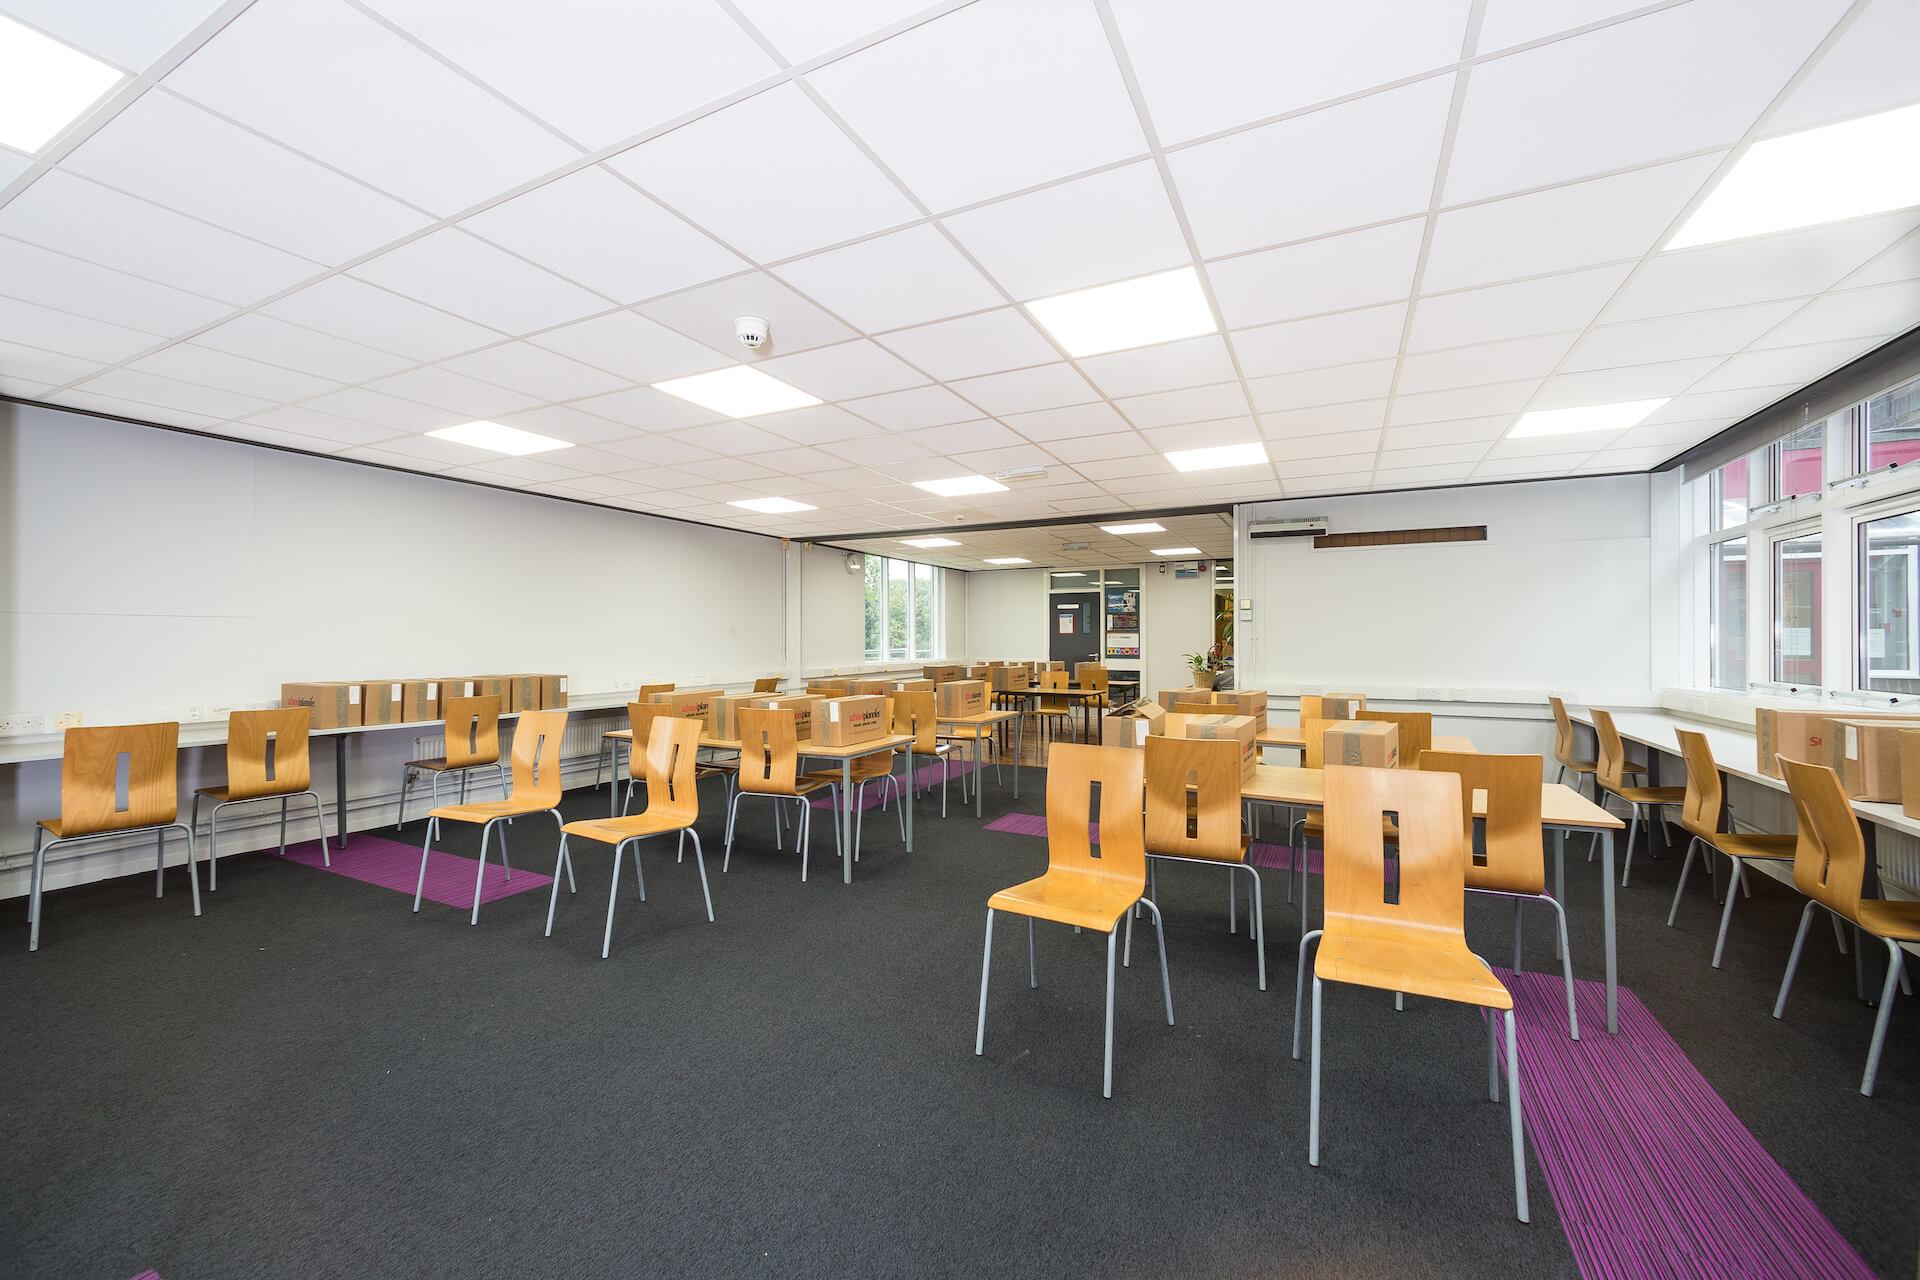 St Mary's School, Menston 5